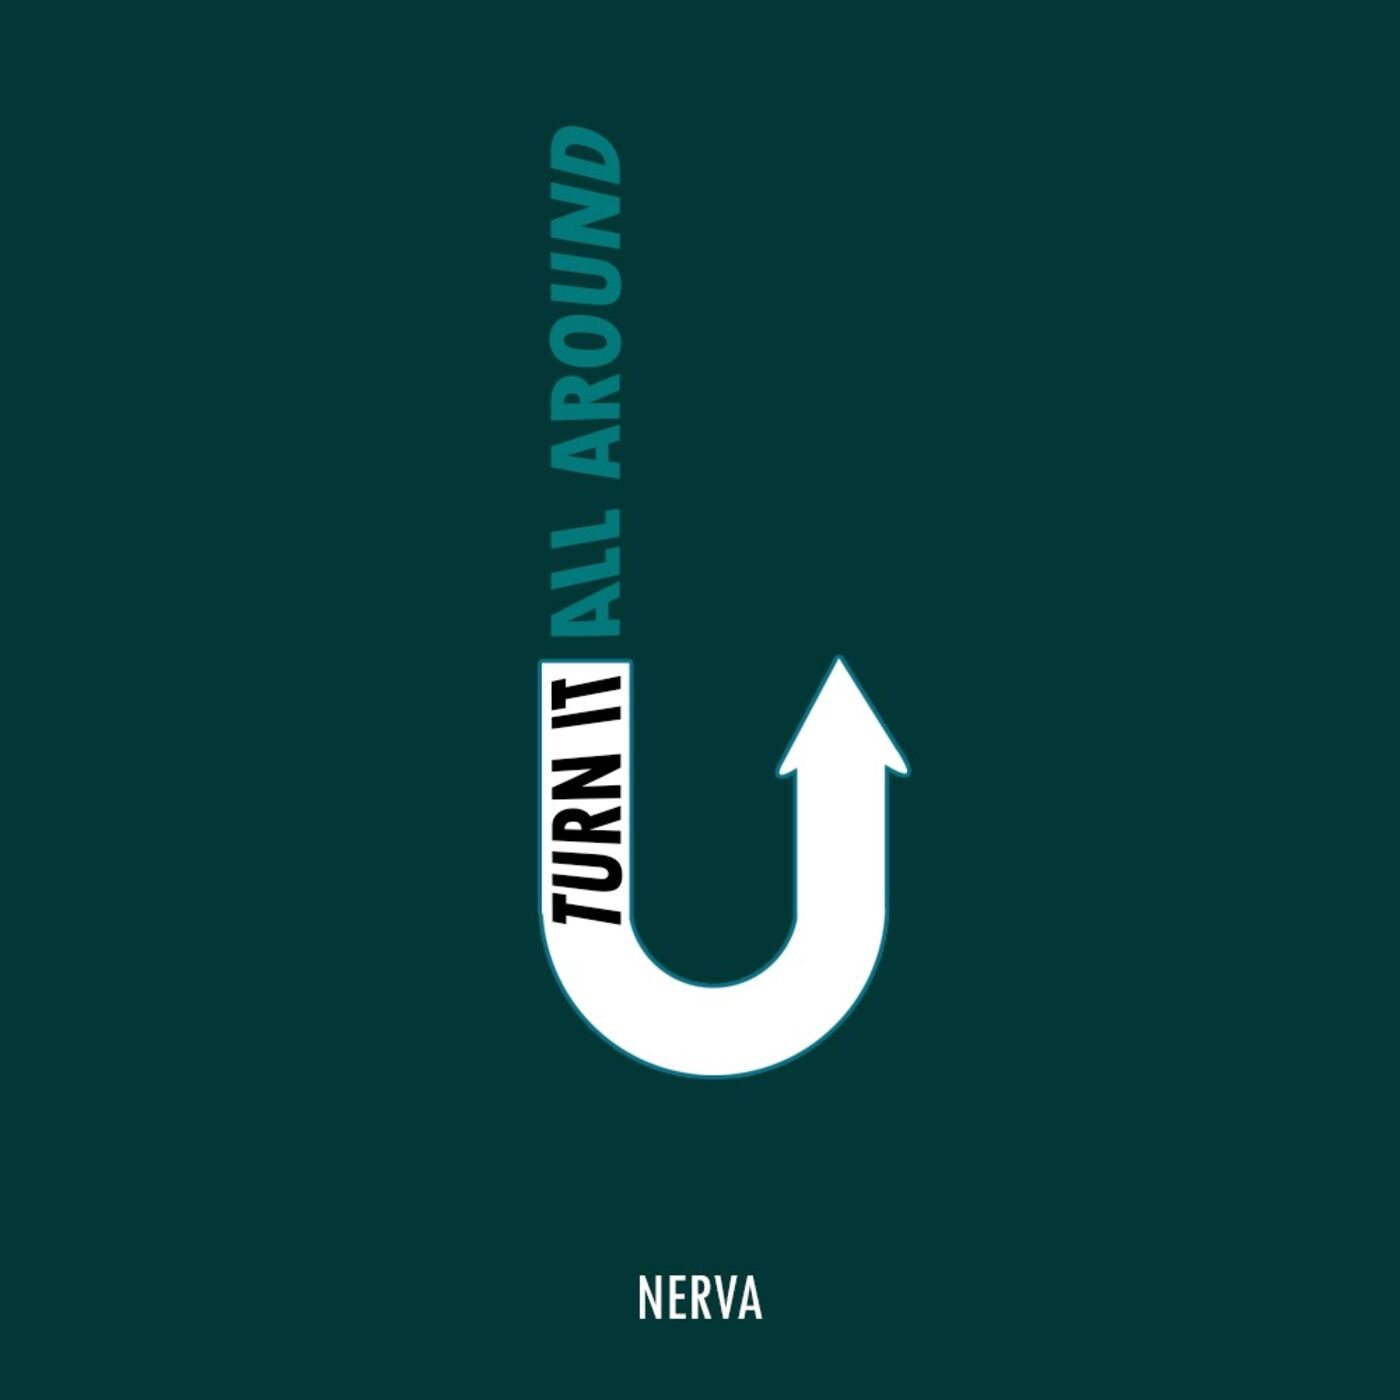 Turn It All Around - Nerva